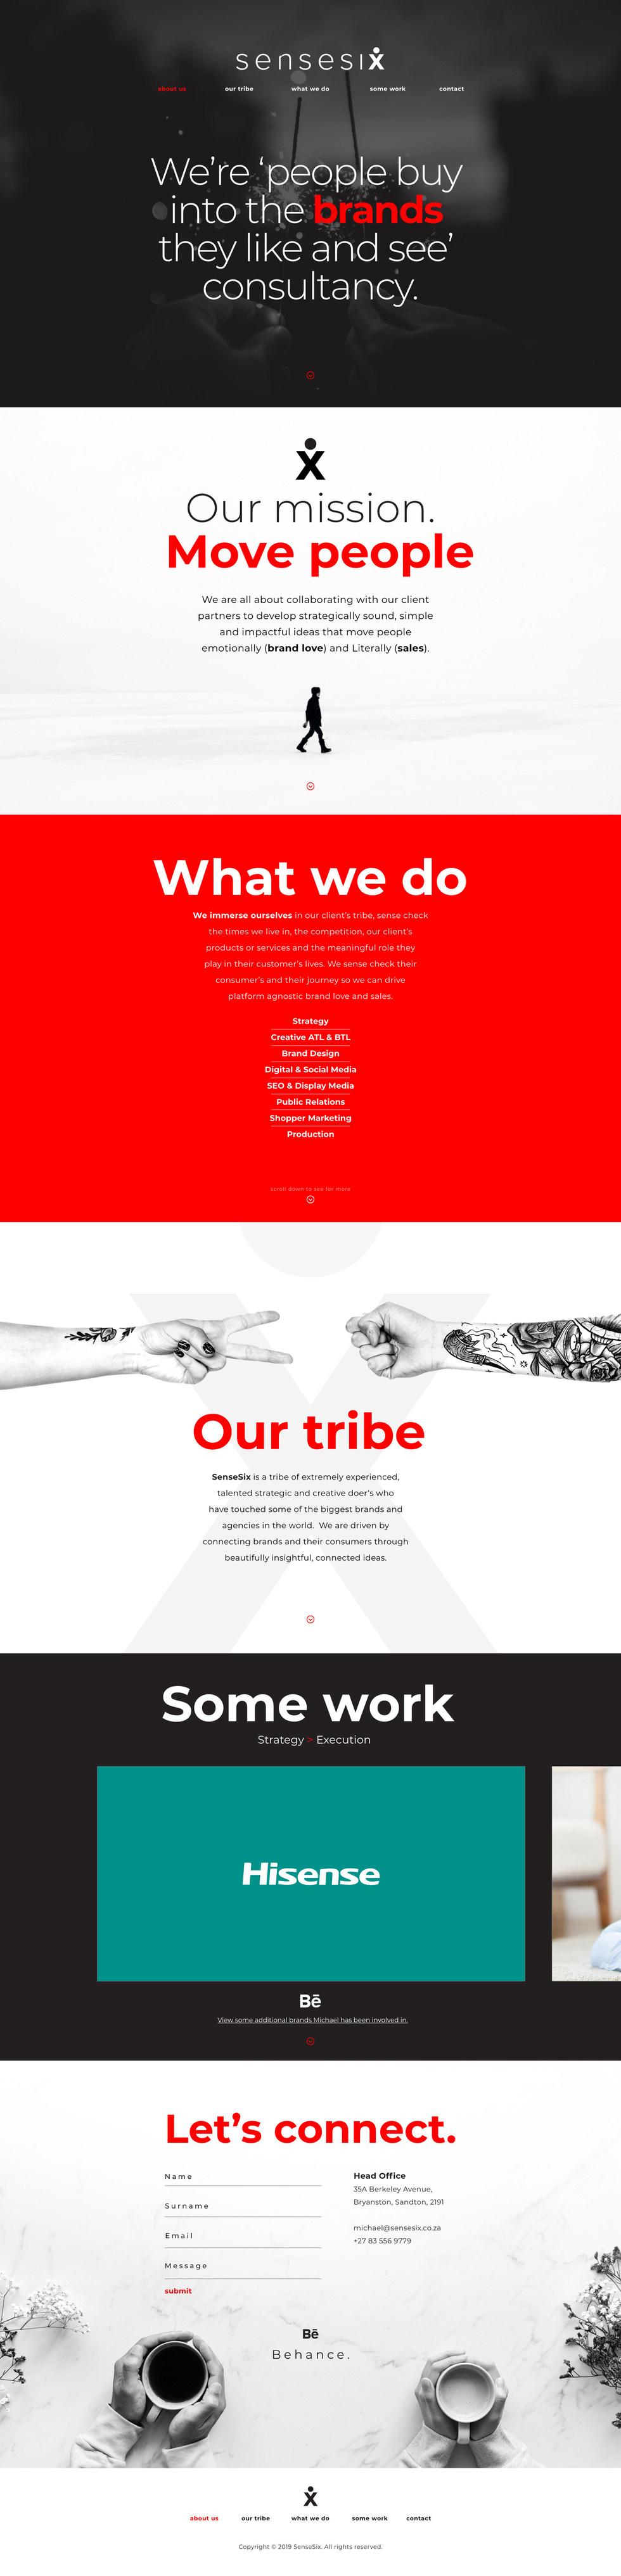 SenseSix-One-Page-website.jpg